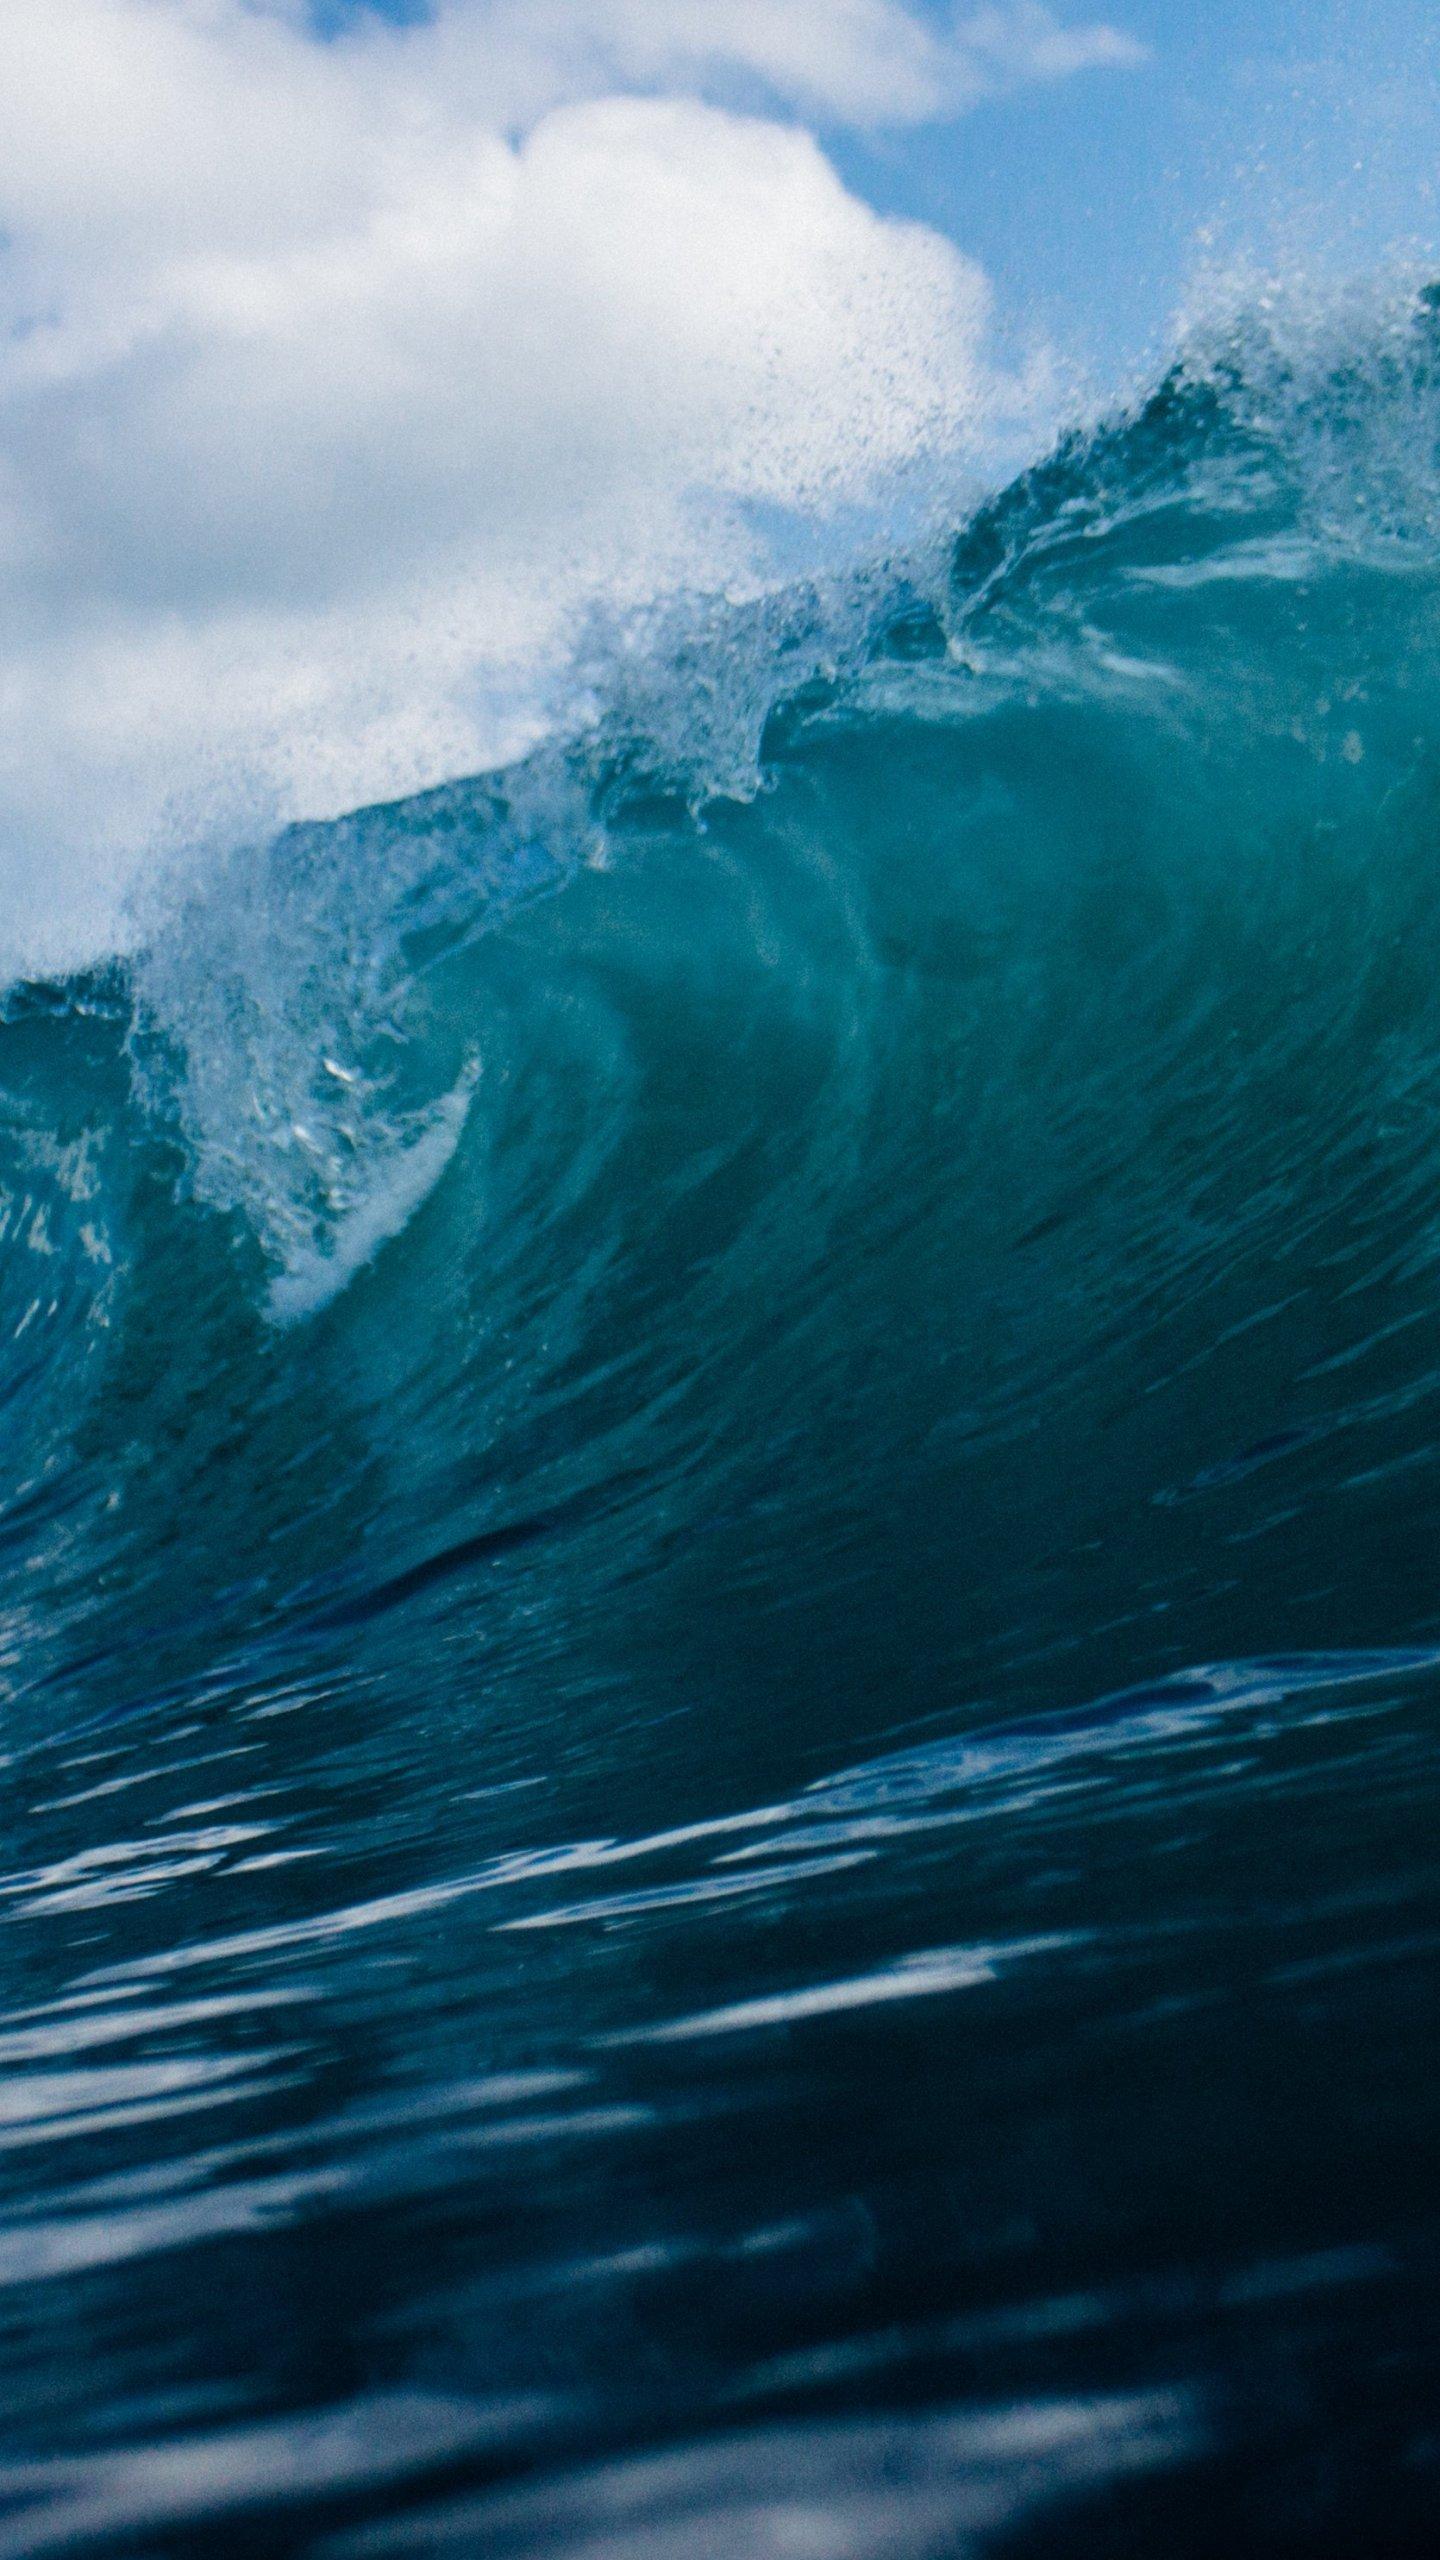 ocean wave wallpaper - mobile & desktop background